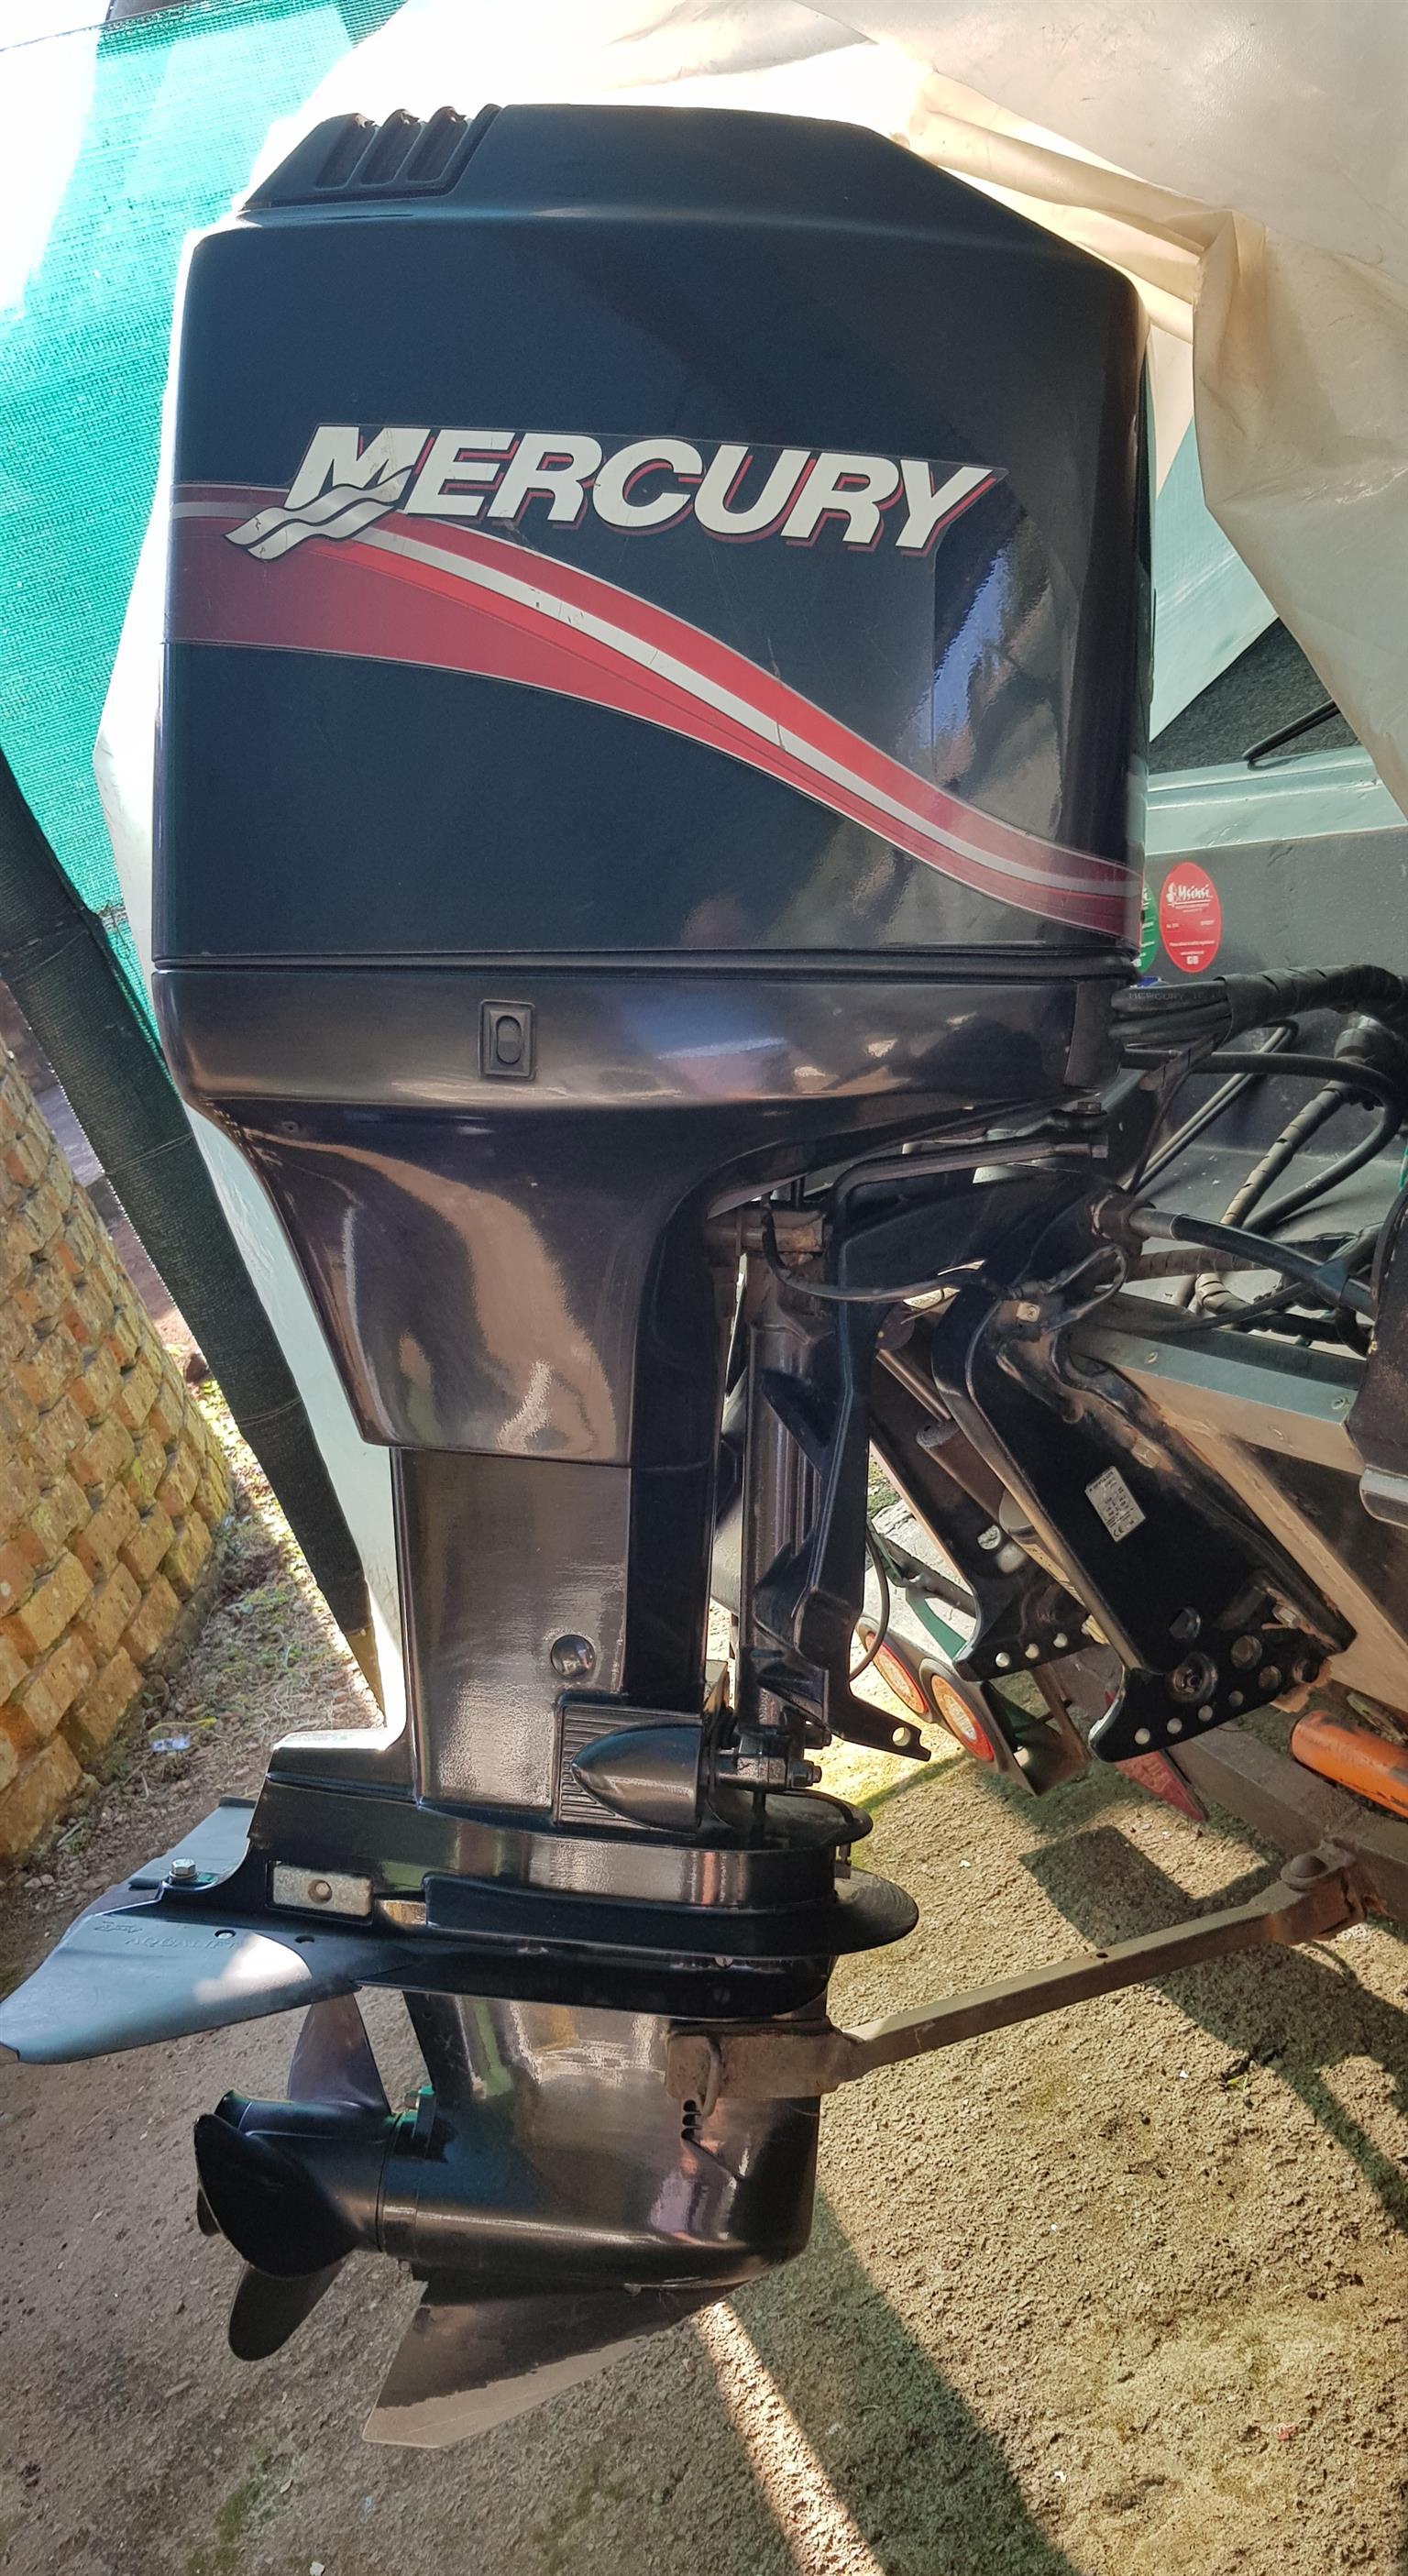 Mercury 125 outboard motor